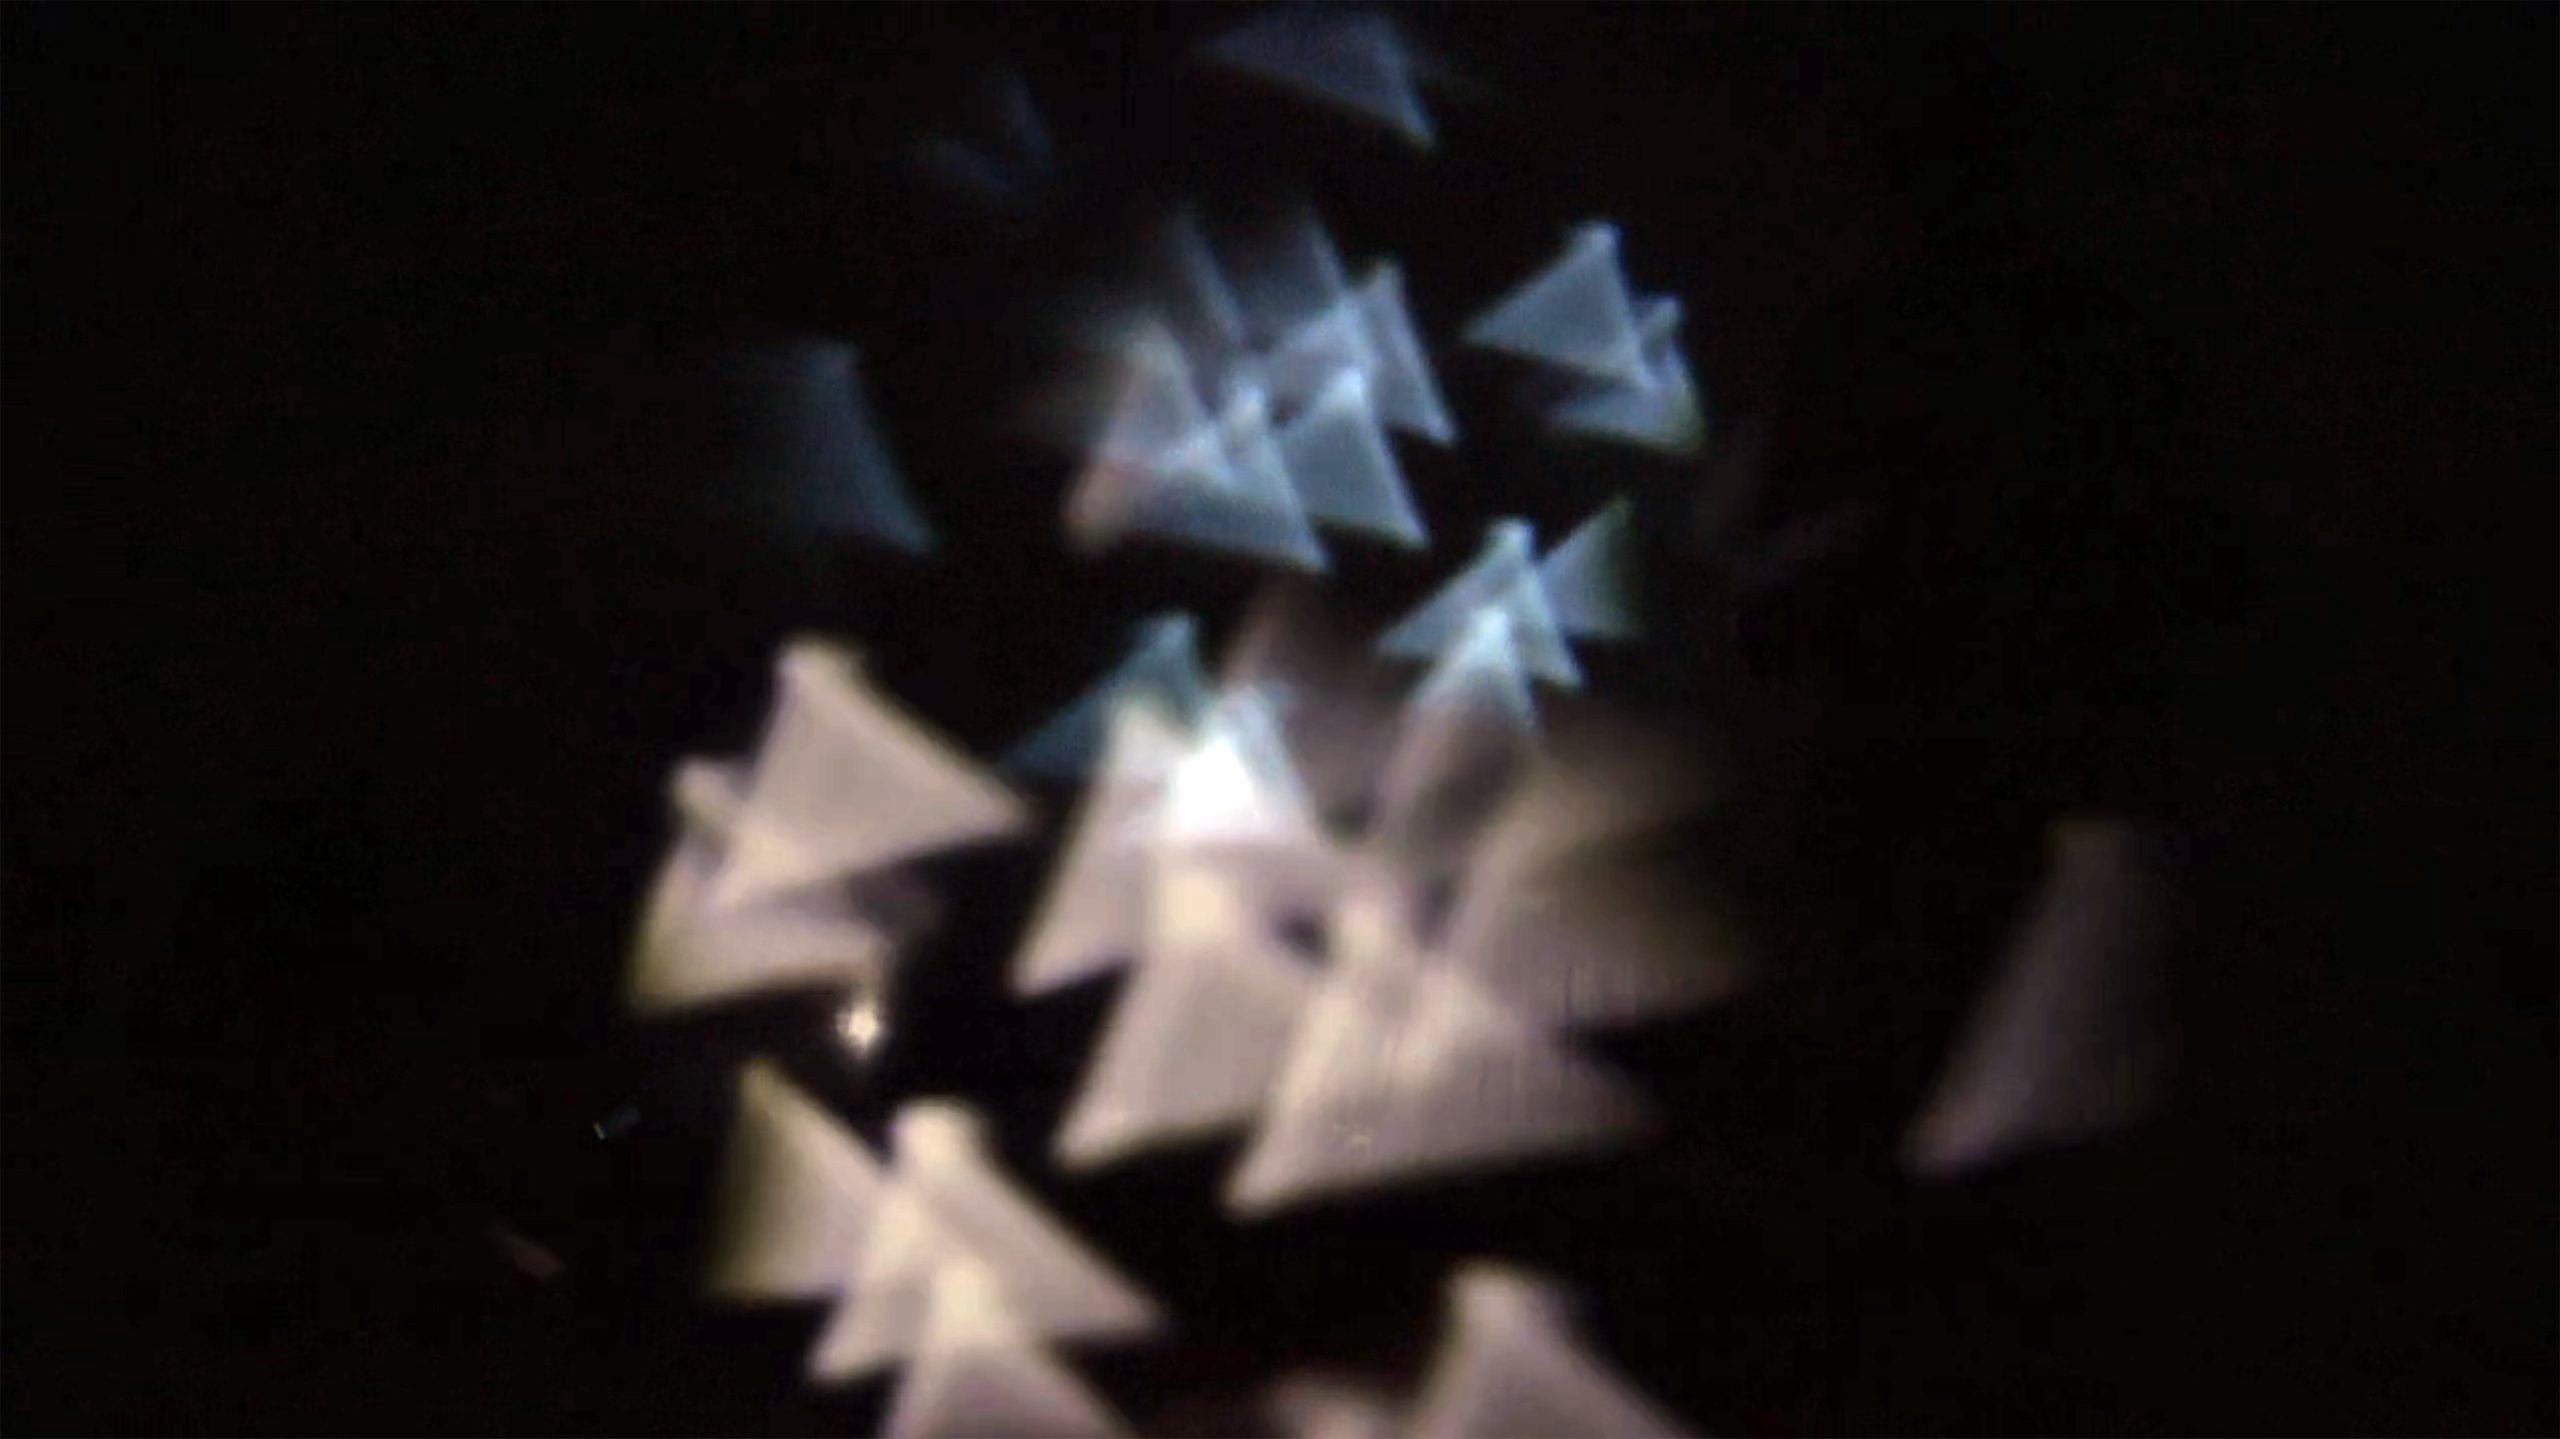 quasi_buio_laboratori E luce fu